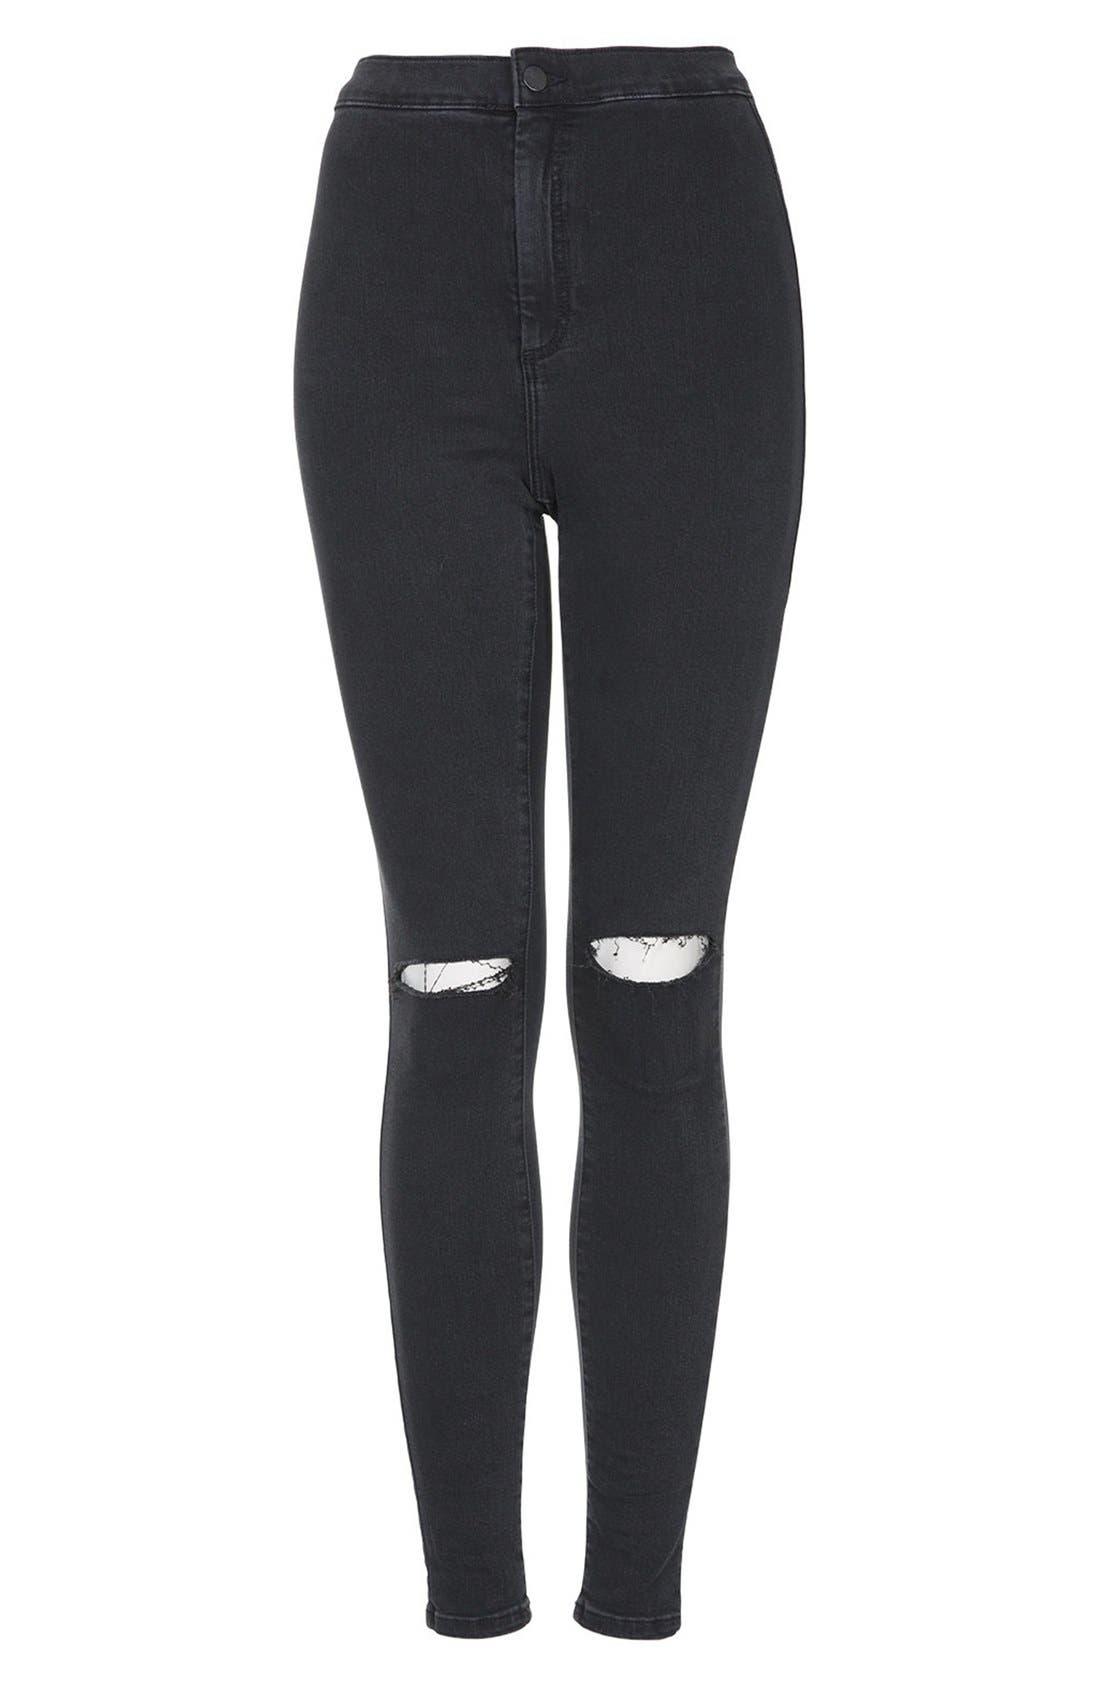 Alternate Image 3  - Topshop 'Joni' Ripped Skinny Jeans (Black)